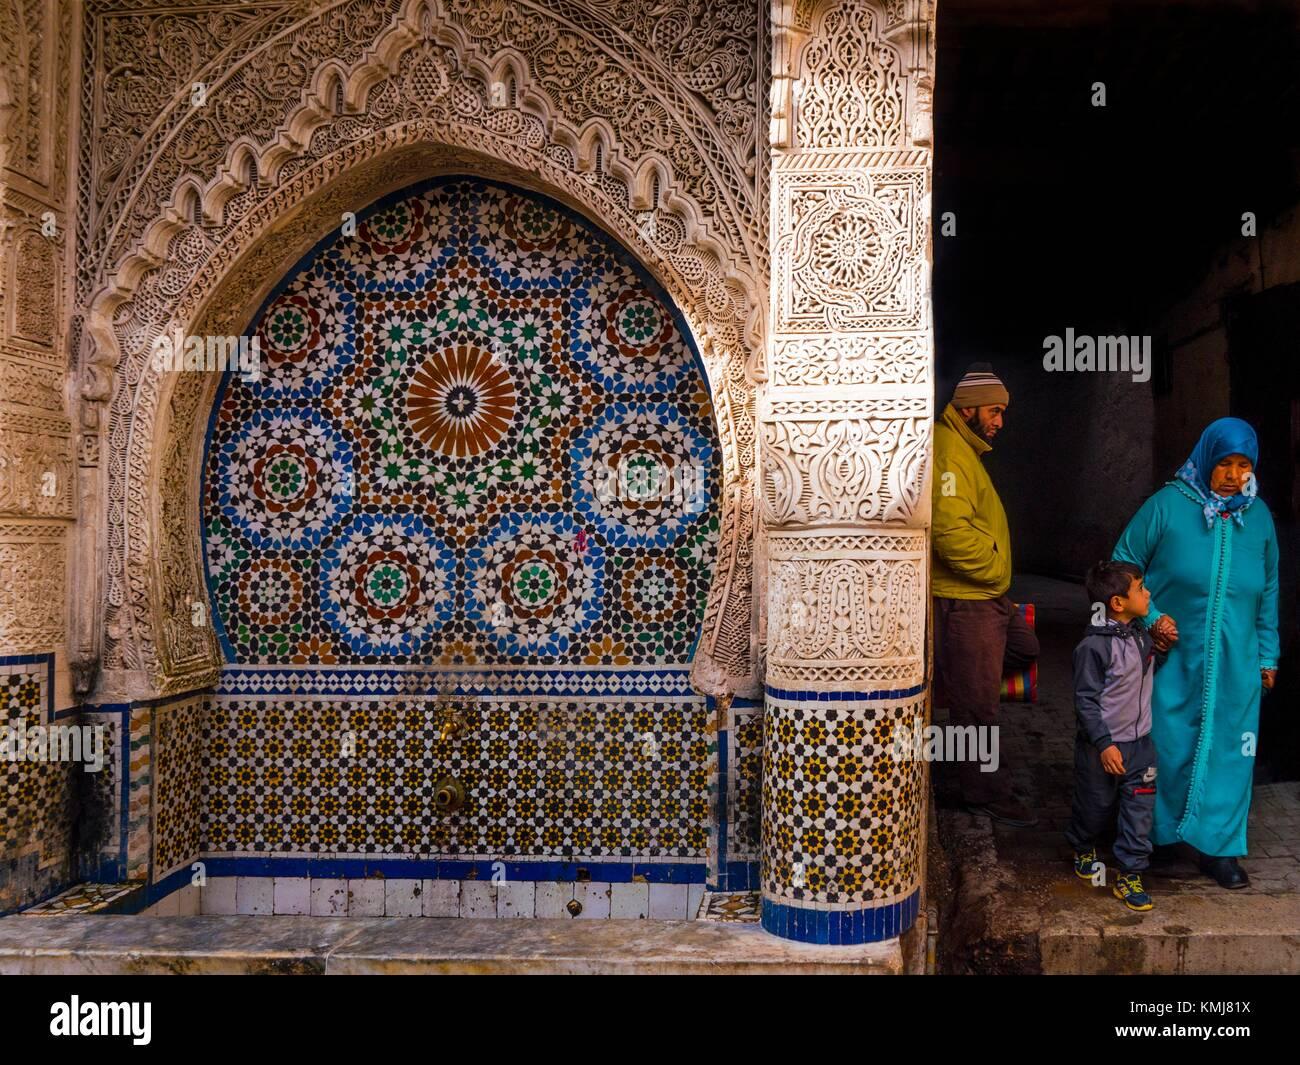 Linda Harland great mosaic   Mosaicos, Lapices de colores